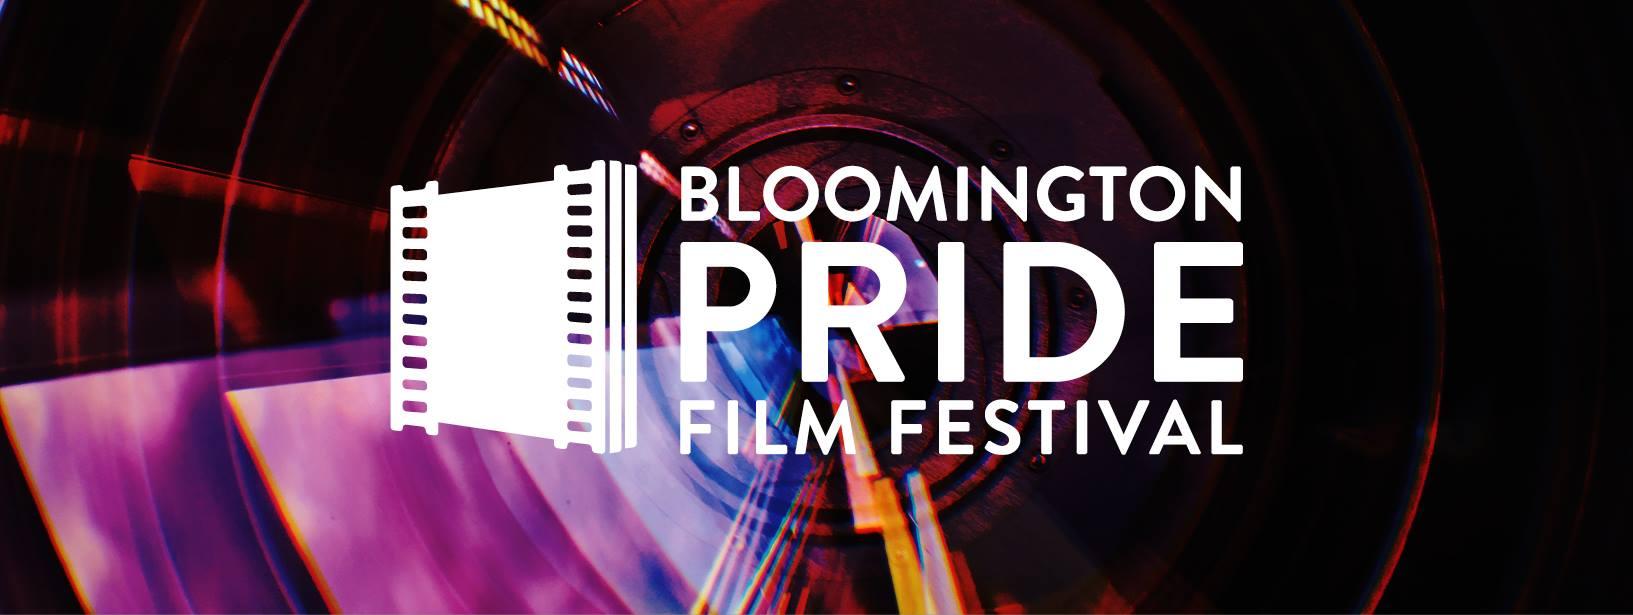 Pride_Film_Fest_2018.jpg